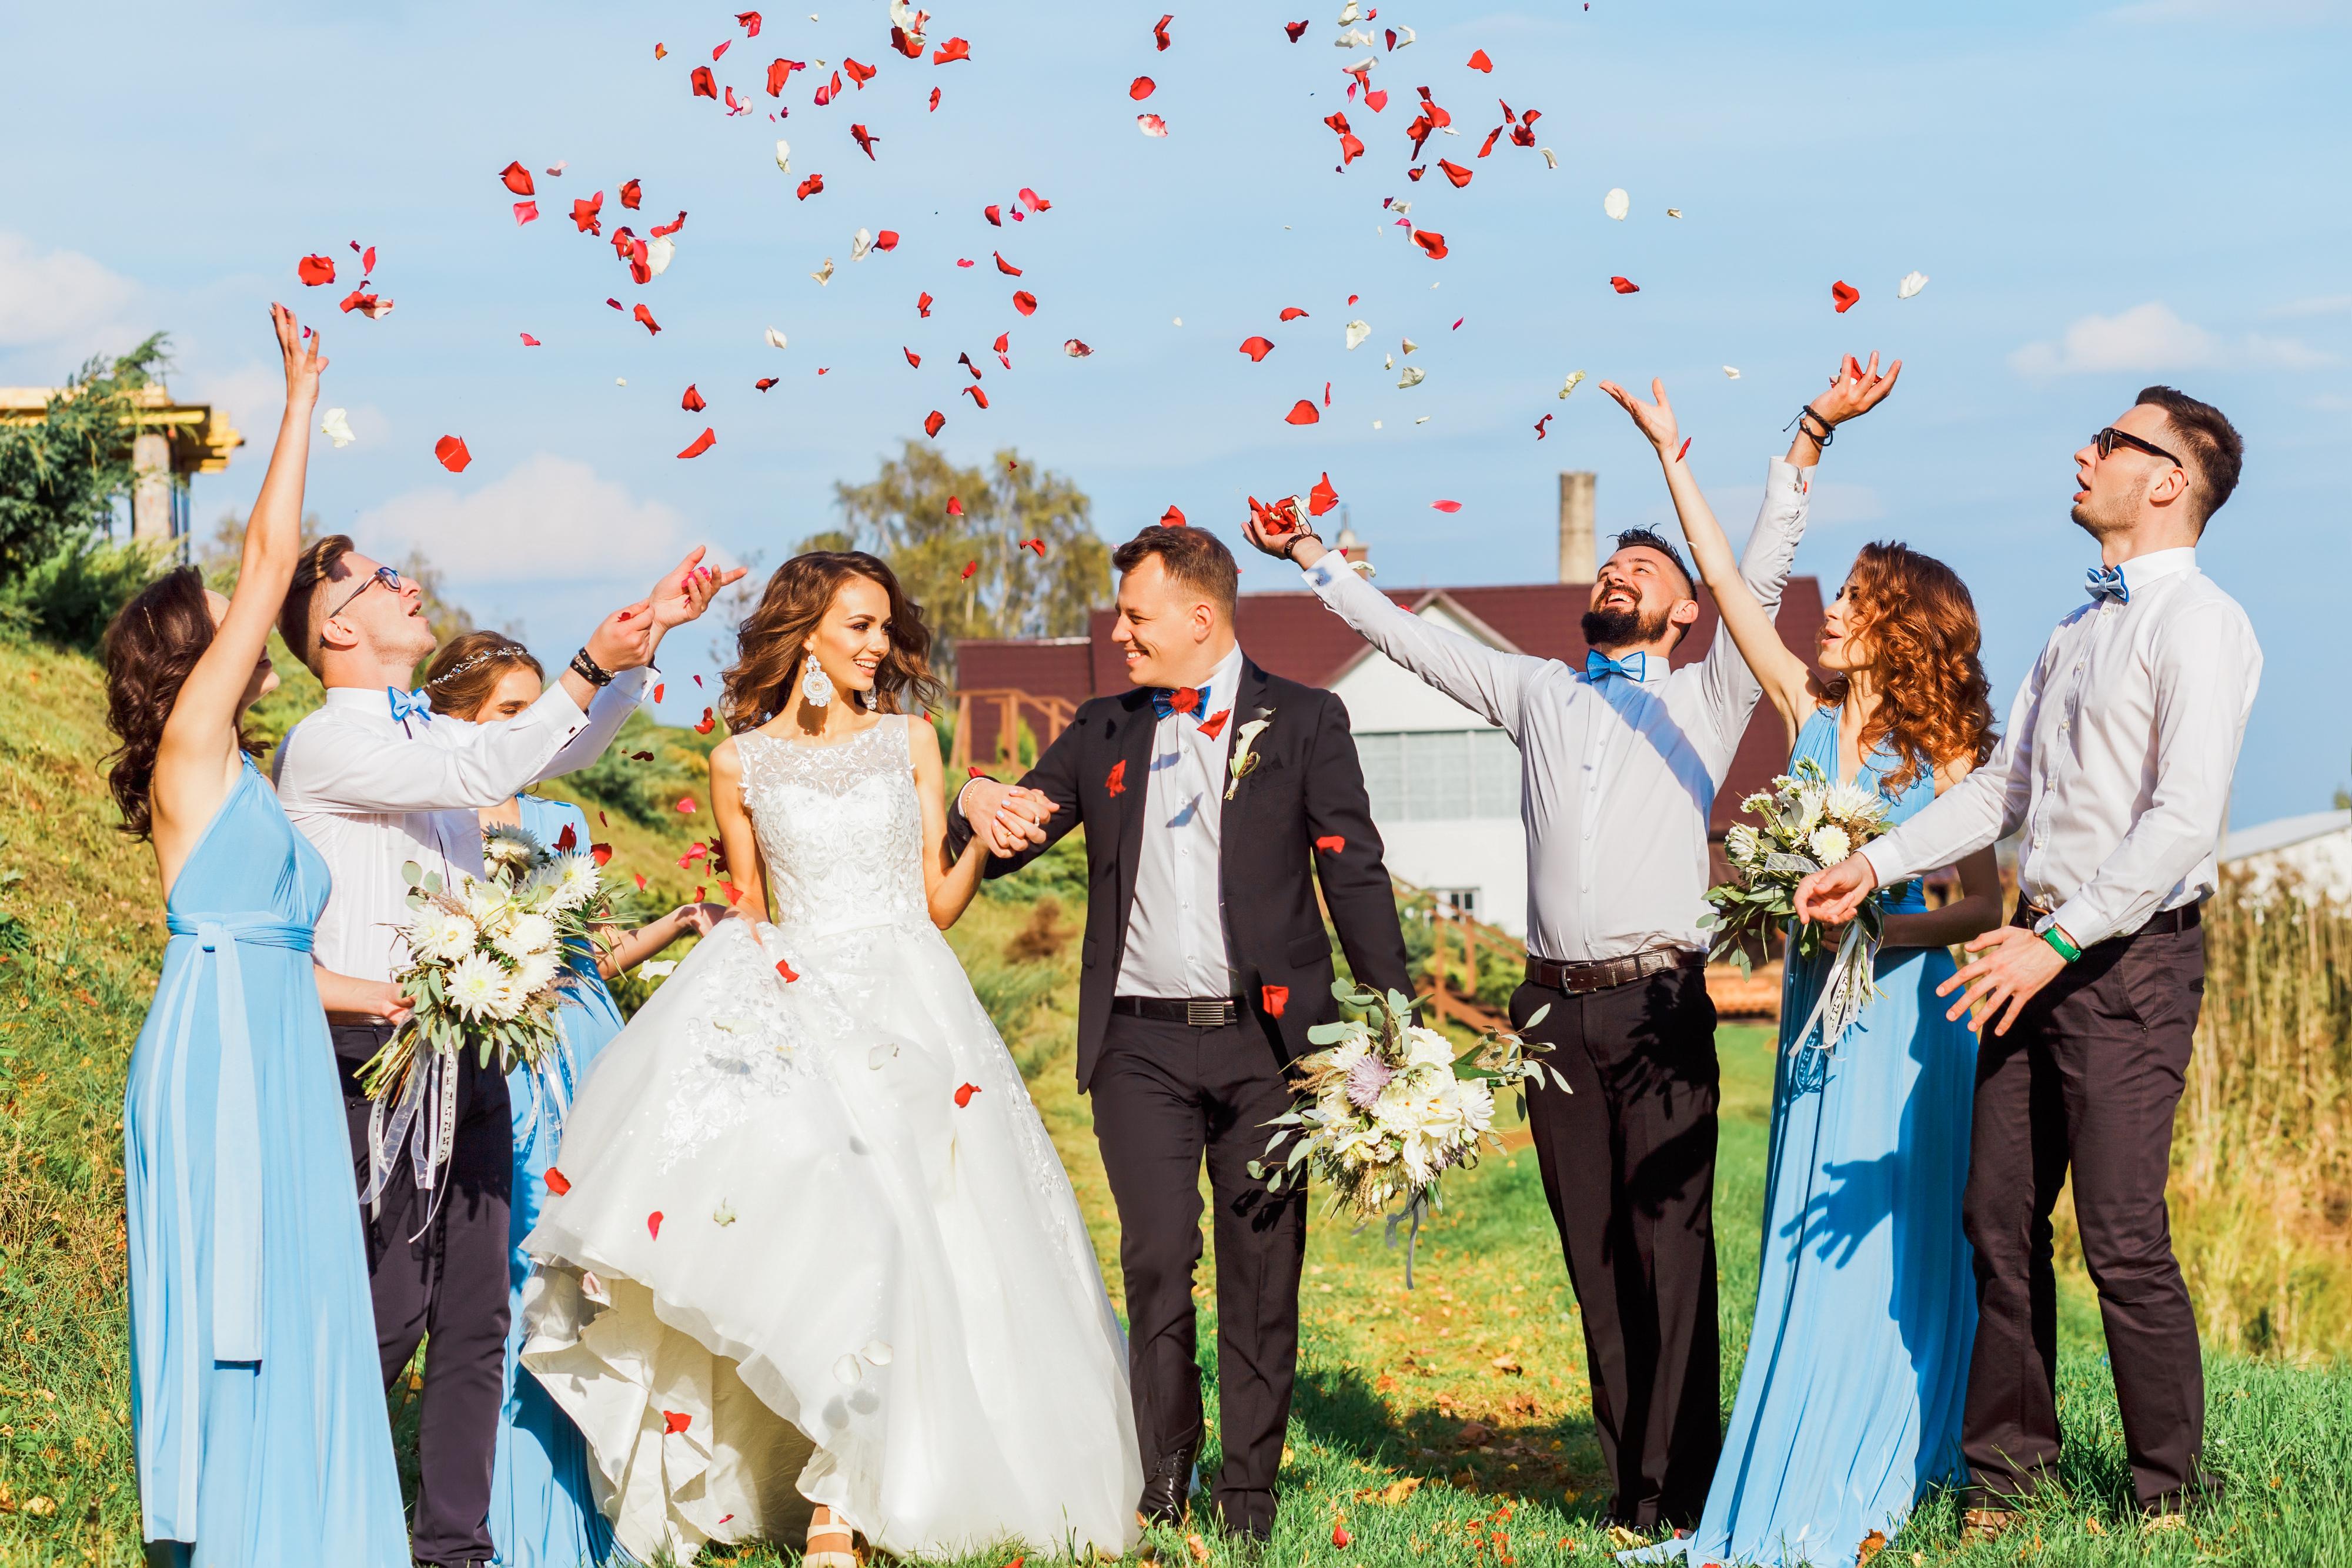 21 Creative Ideas To Make An Unforgettable Wedding Exit